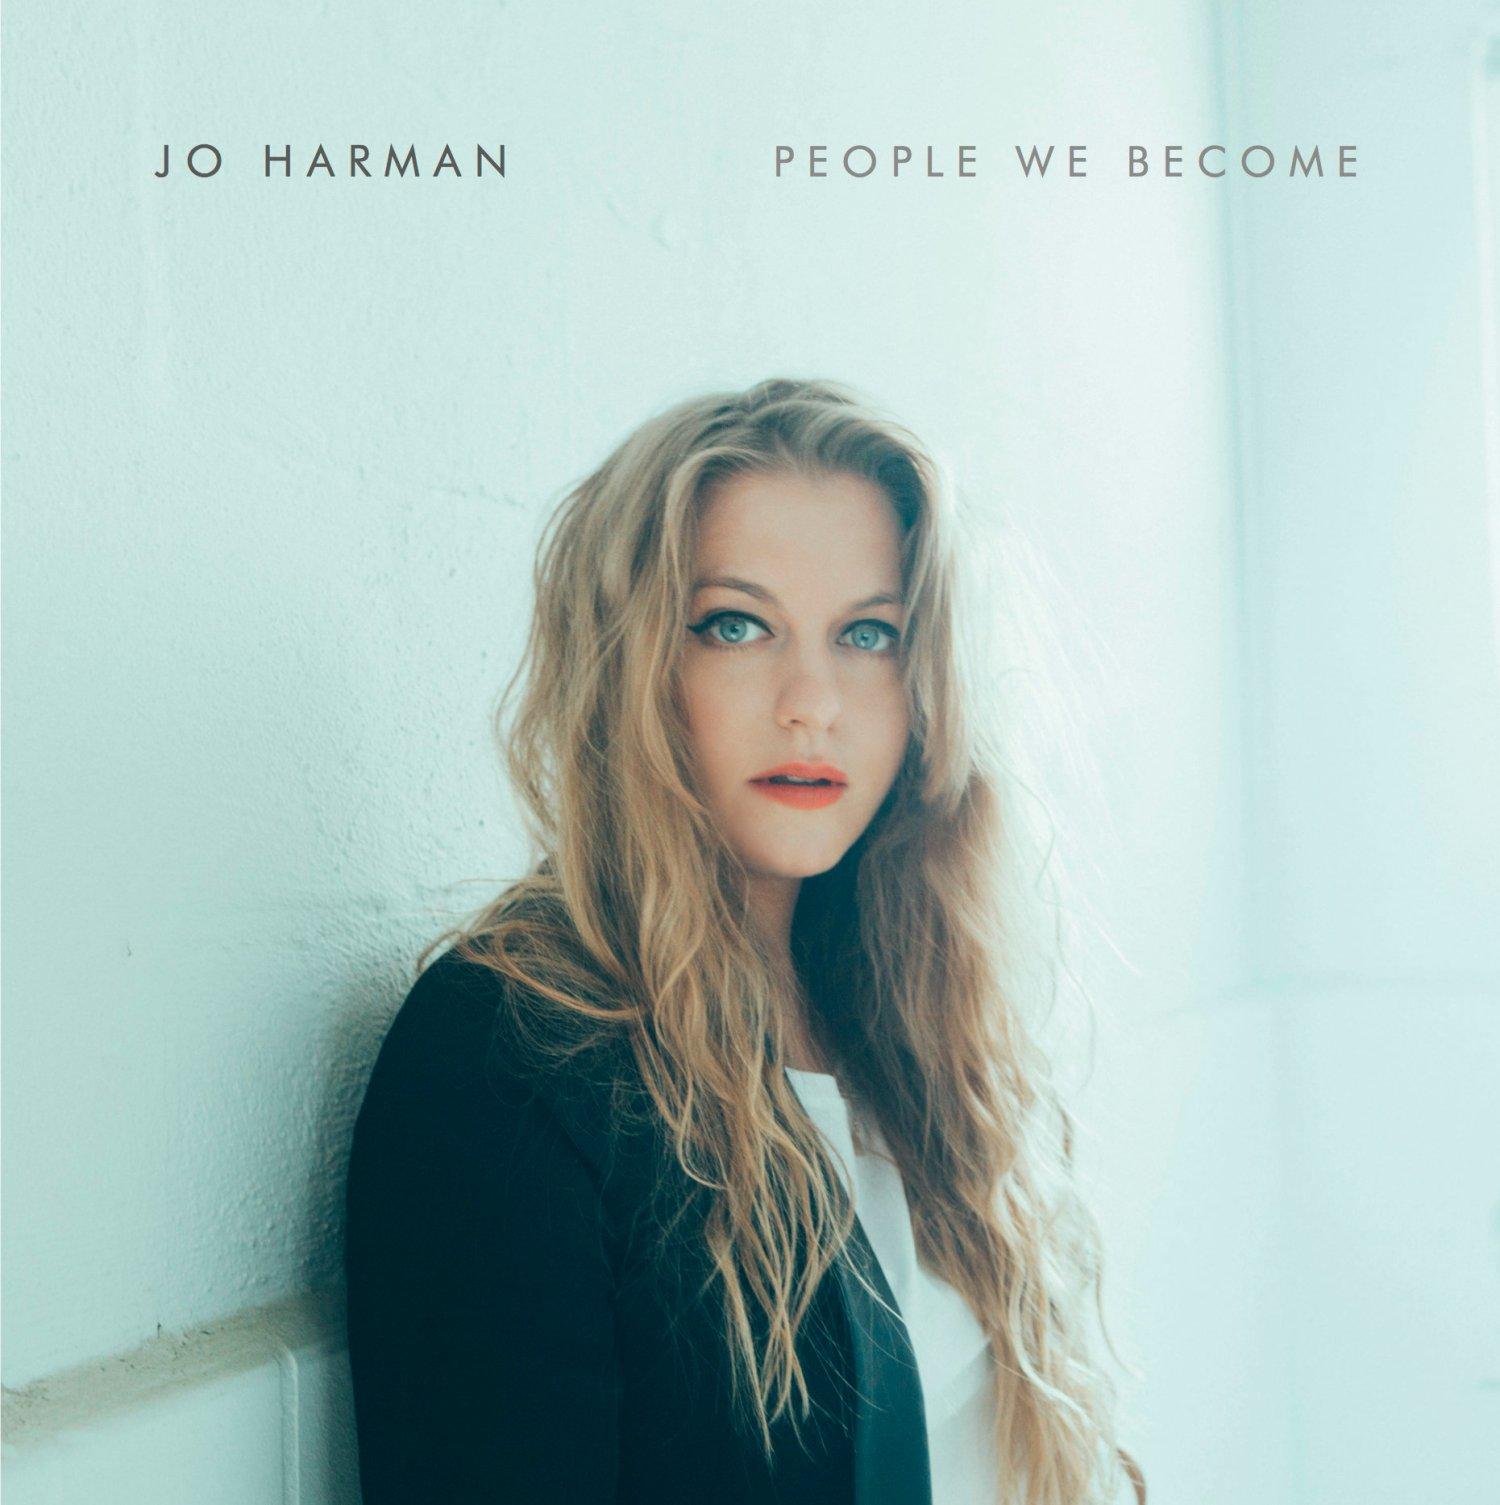 people-we-become